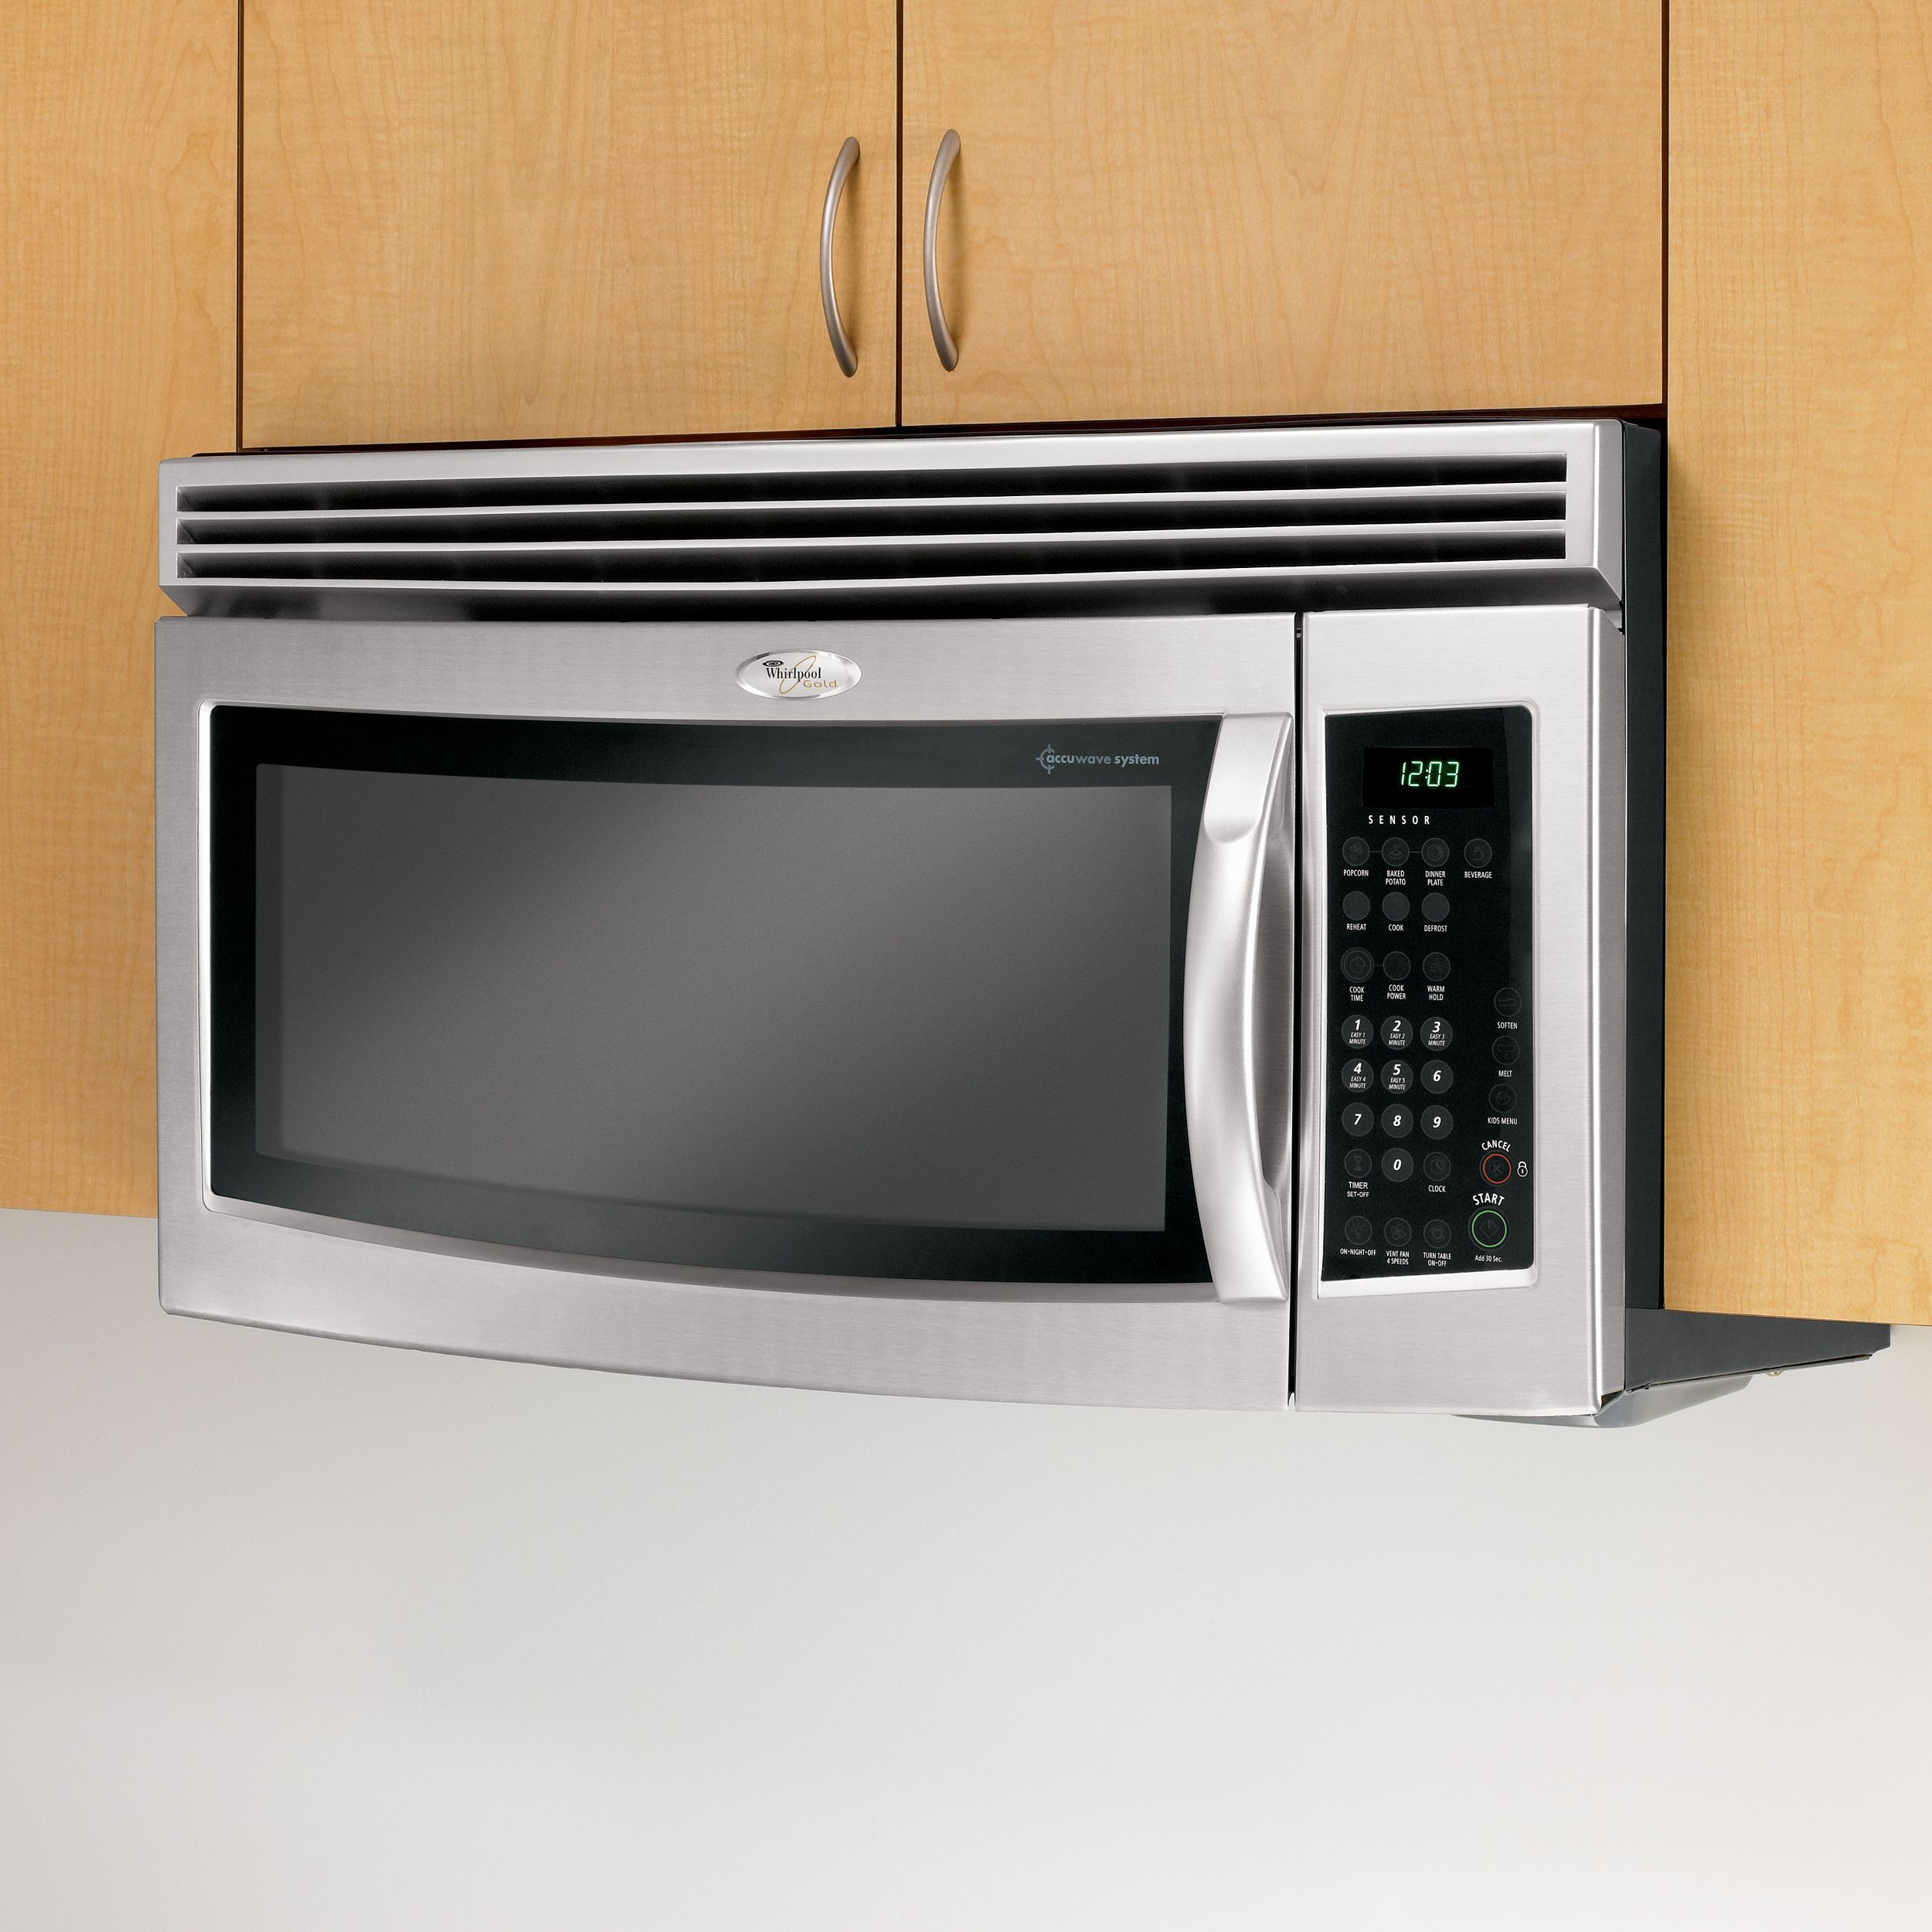 medium resolution of whirlpool microwave hood wiring diagram model gh5184xps3 design